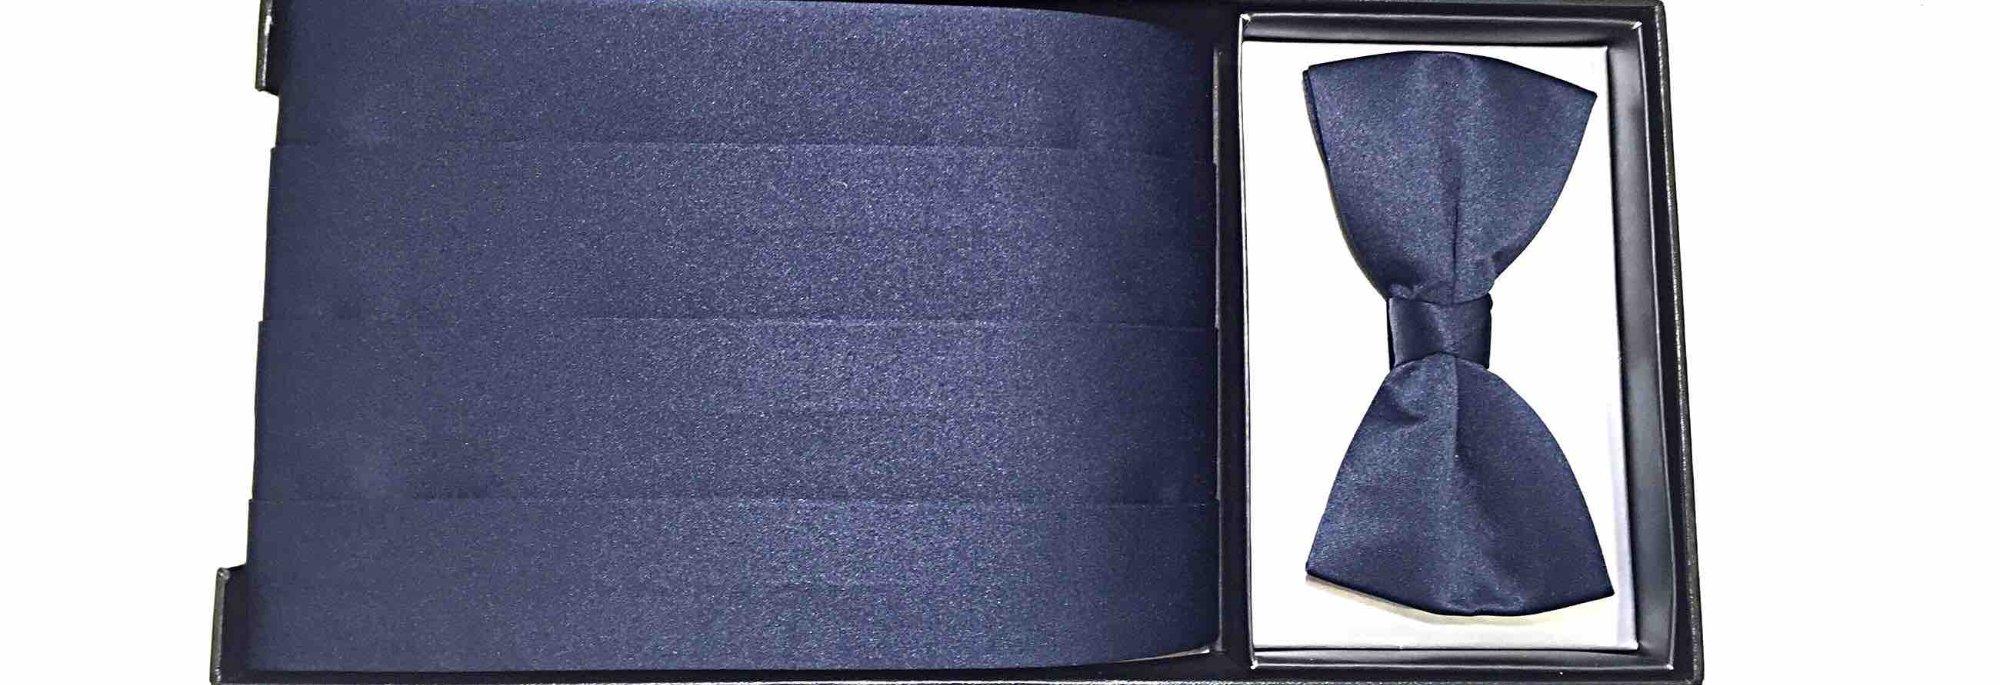 Taillole noeud bleu